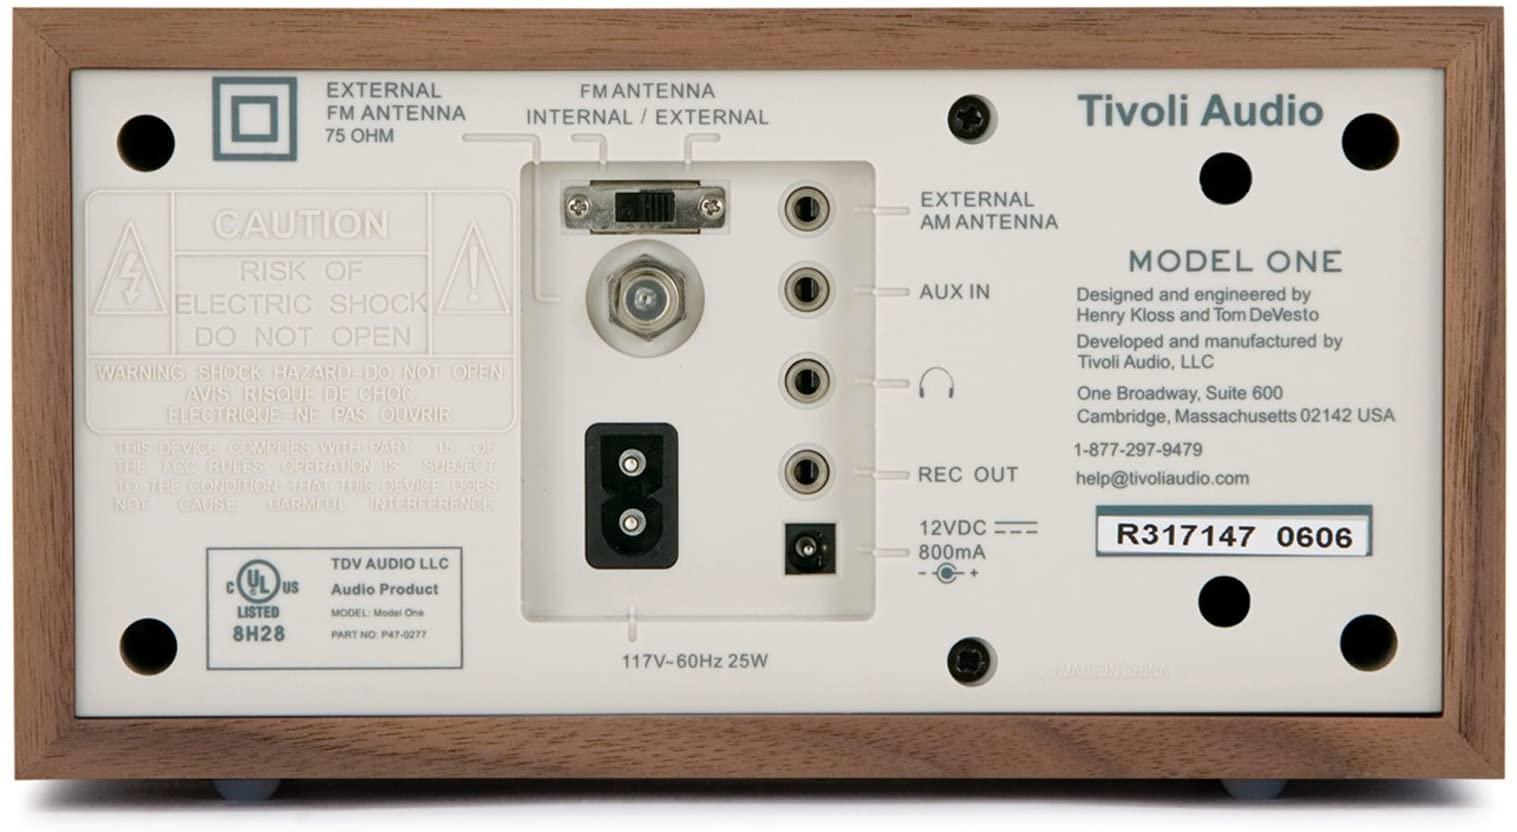 tivoli-audio-model-one-retro-am-fm-radio-back